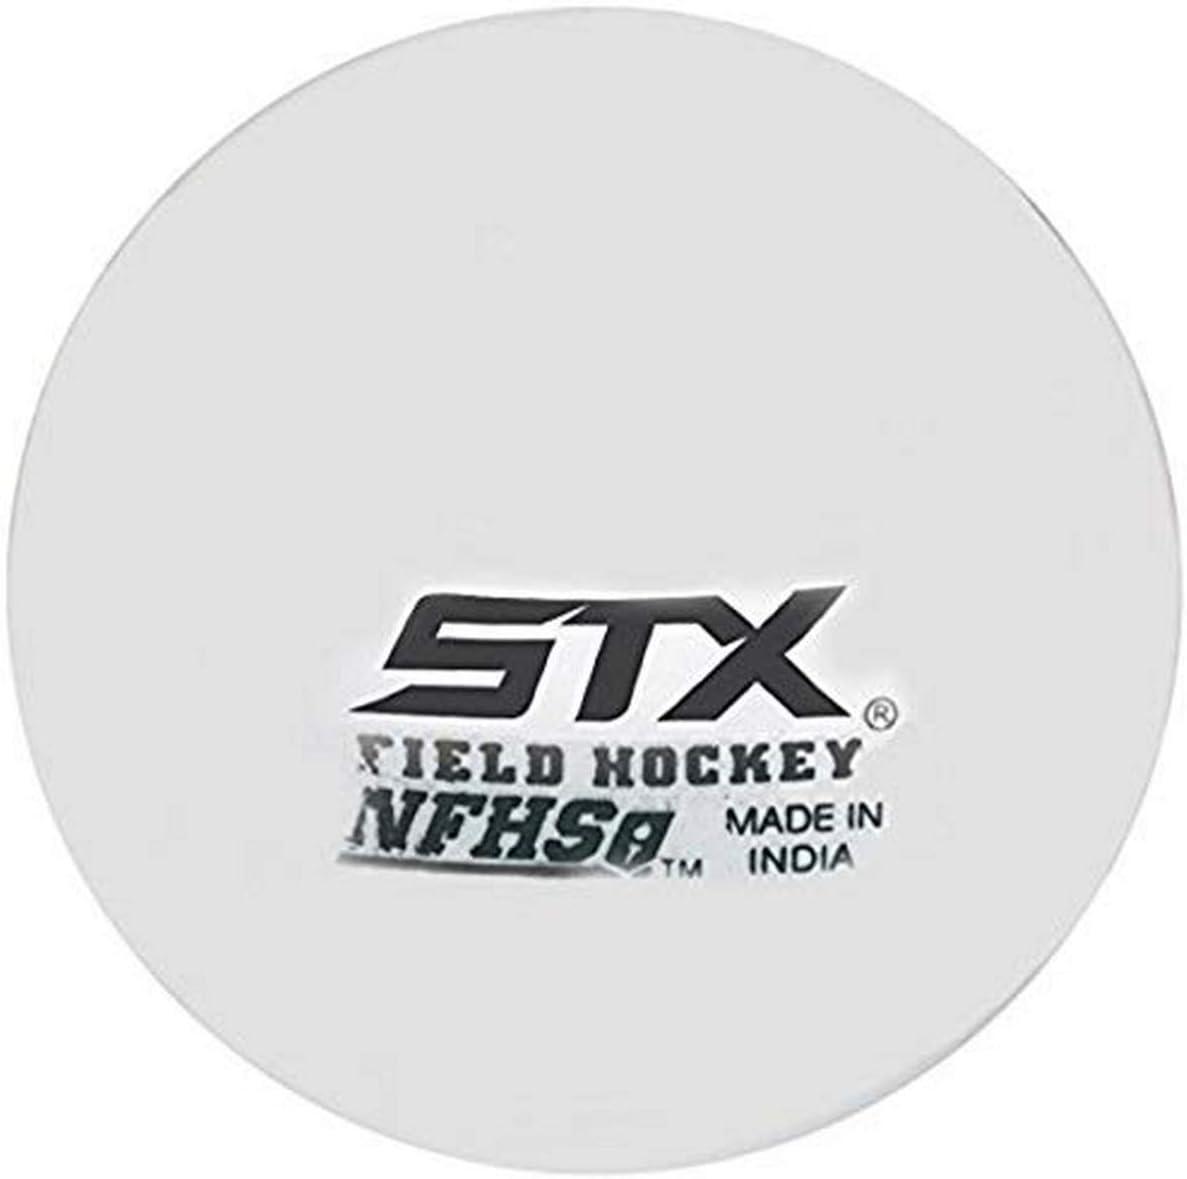 STX Field Hockey Official Game OFFer 12-Pack Ball Rare